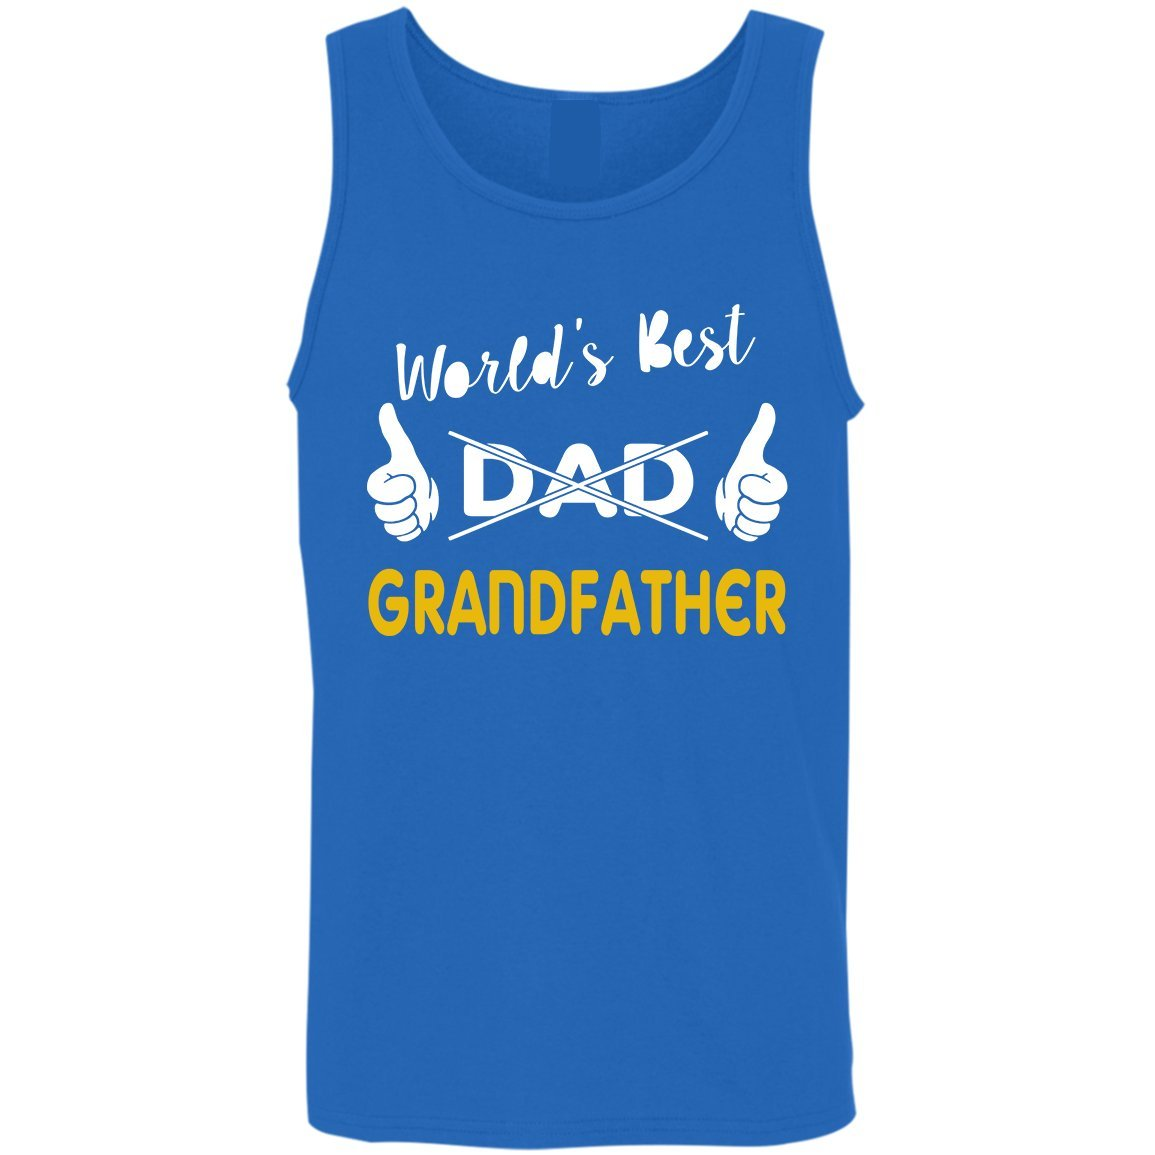 23047e46920 Amazon.com  Kidoba World s Best Dad Grandfather Shirt - Papa Men Shirt - Father s  Day Tank Top  Clothing